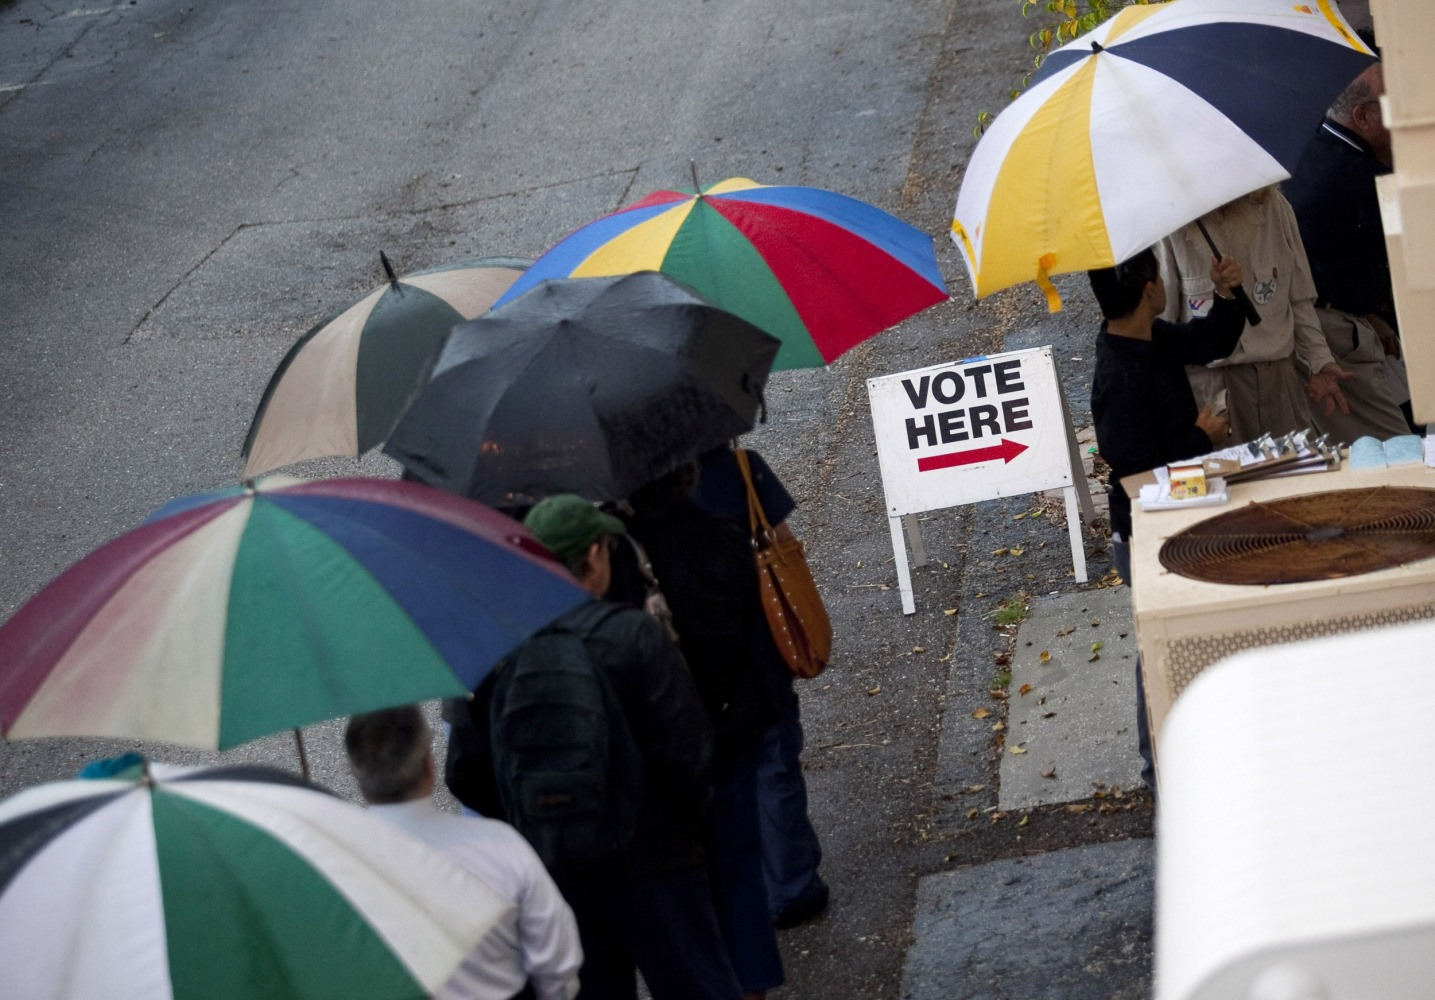 Federal Judge Orders More Time for Voter Registration in Florida